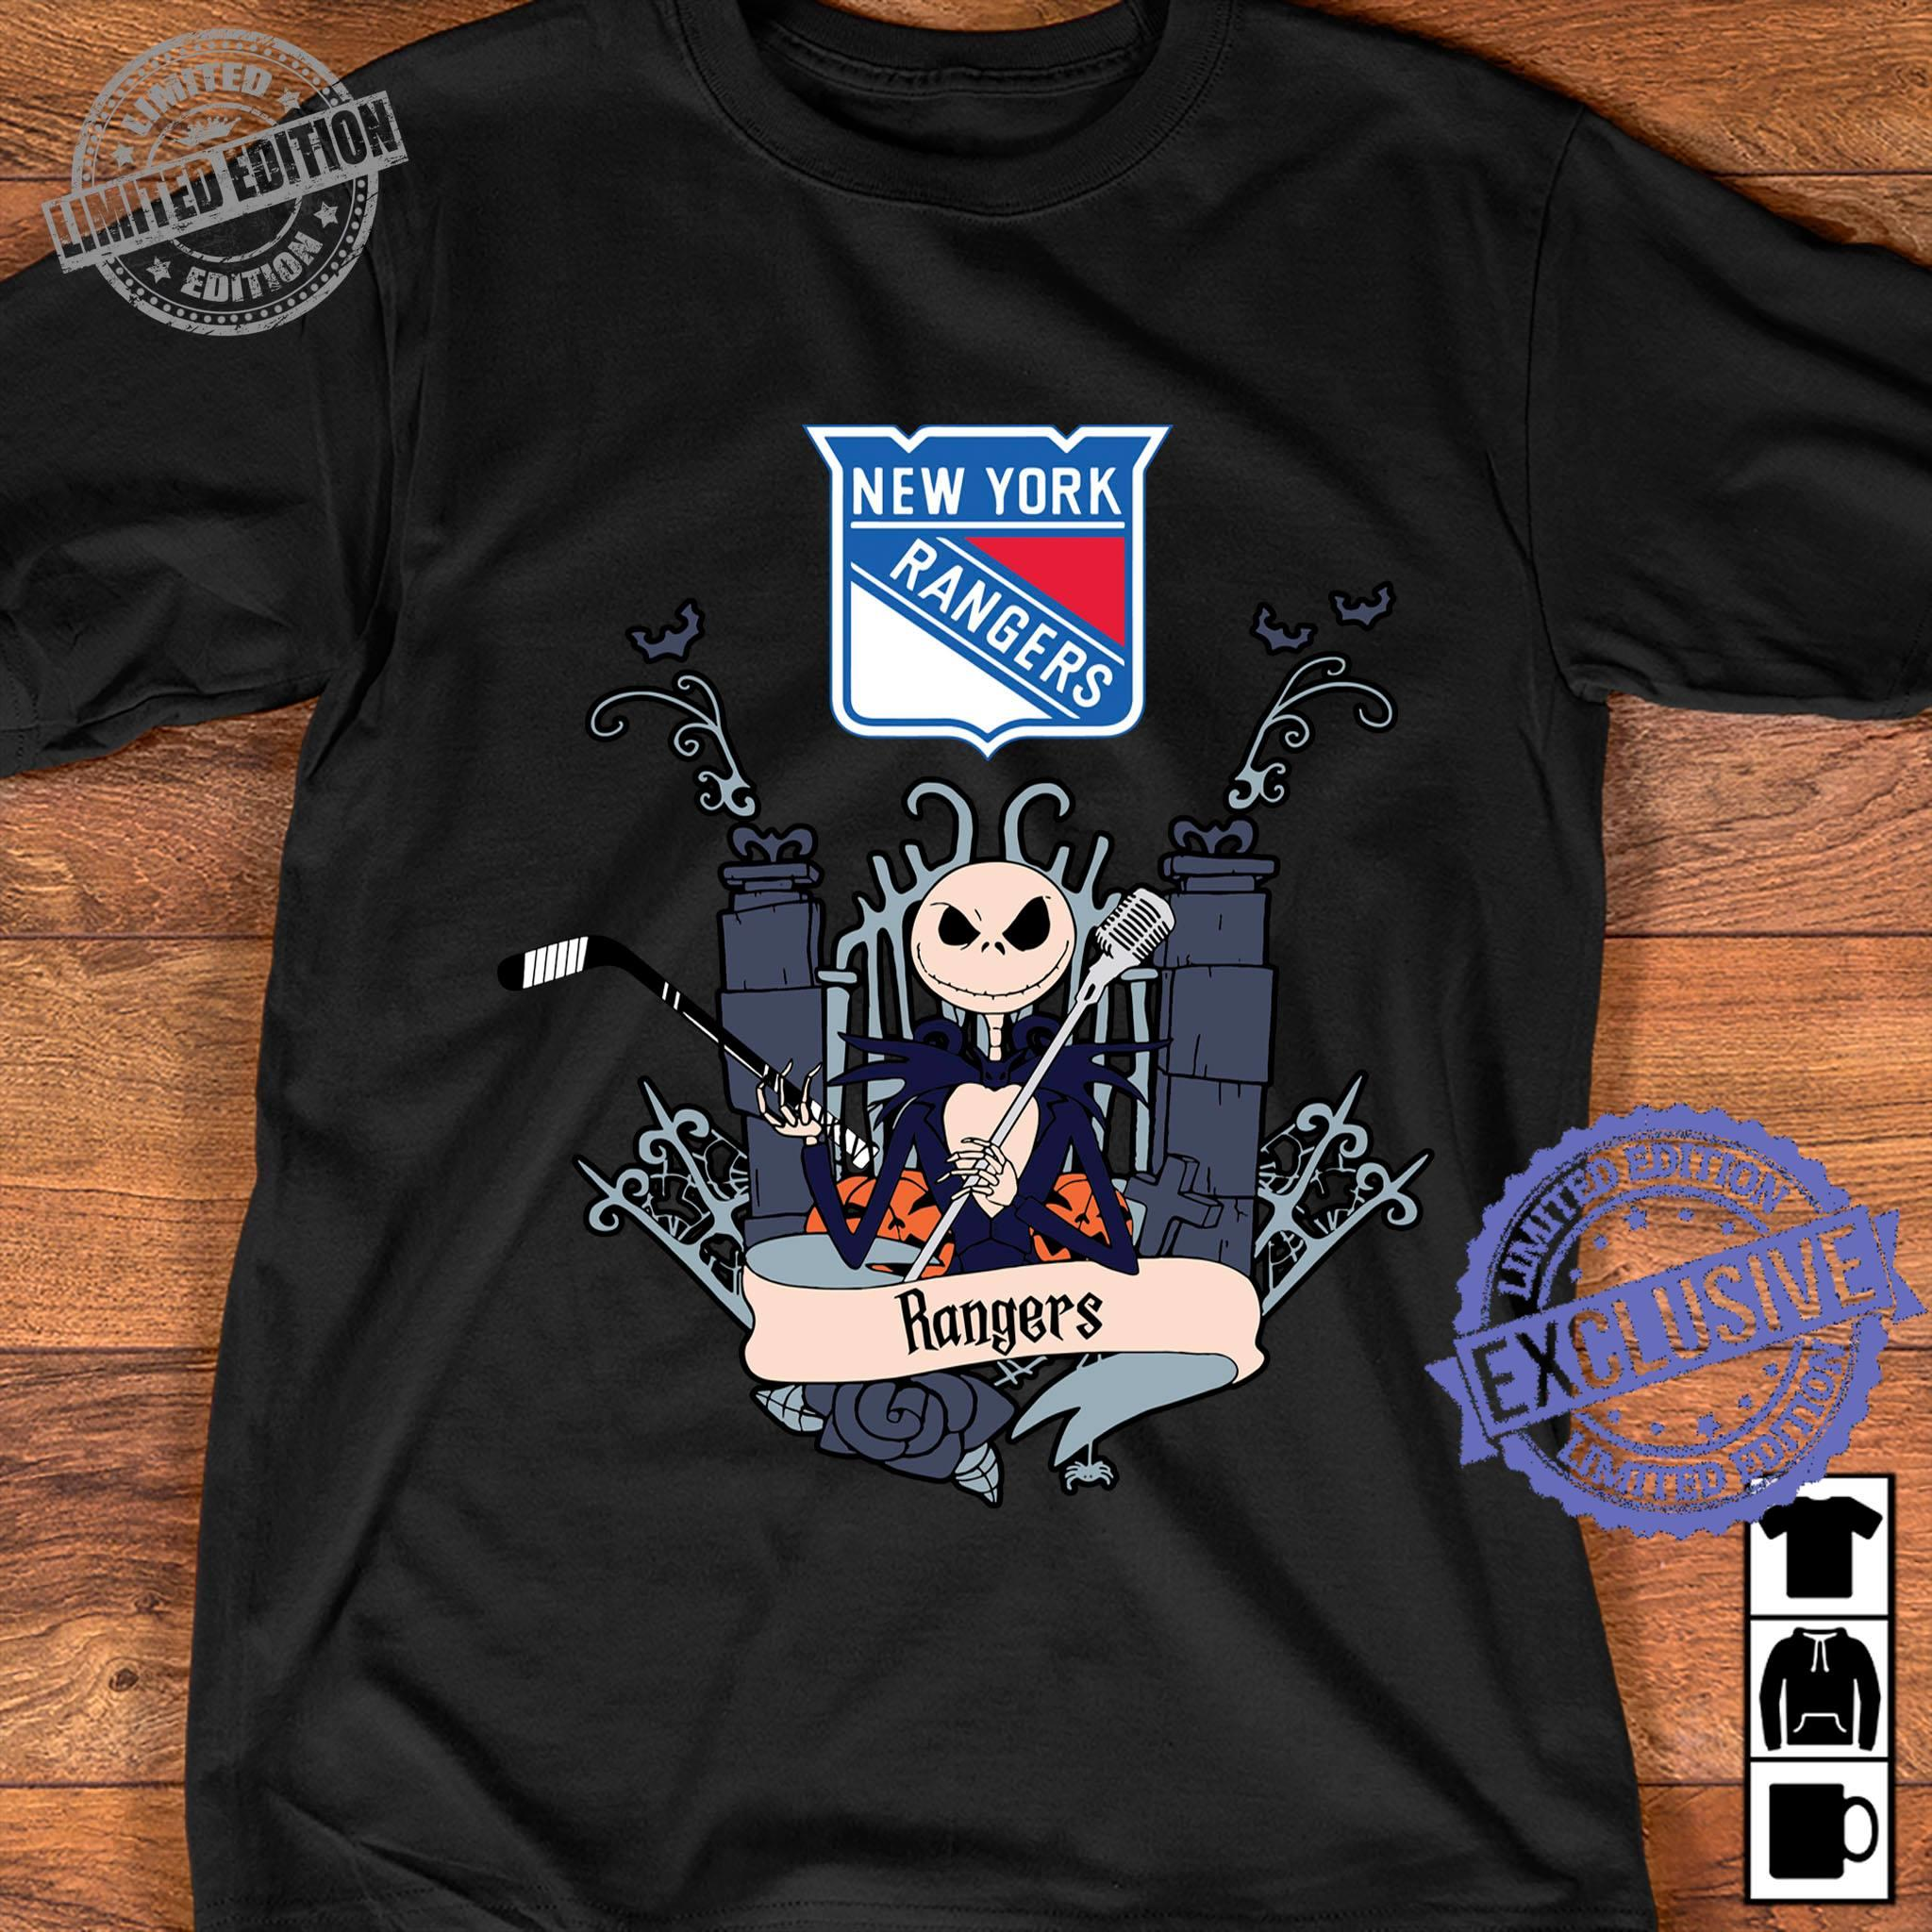 New york rangers shirt